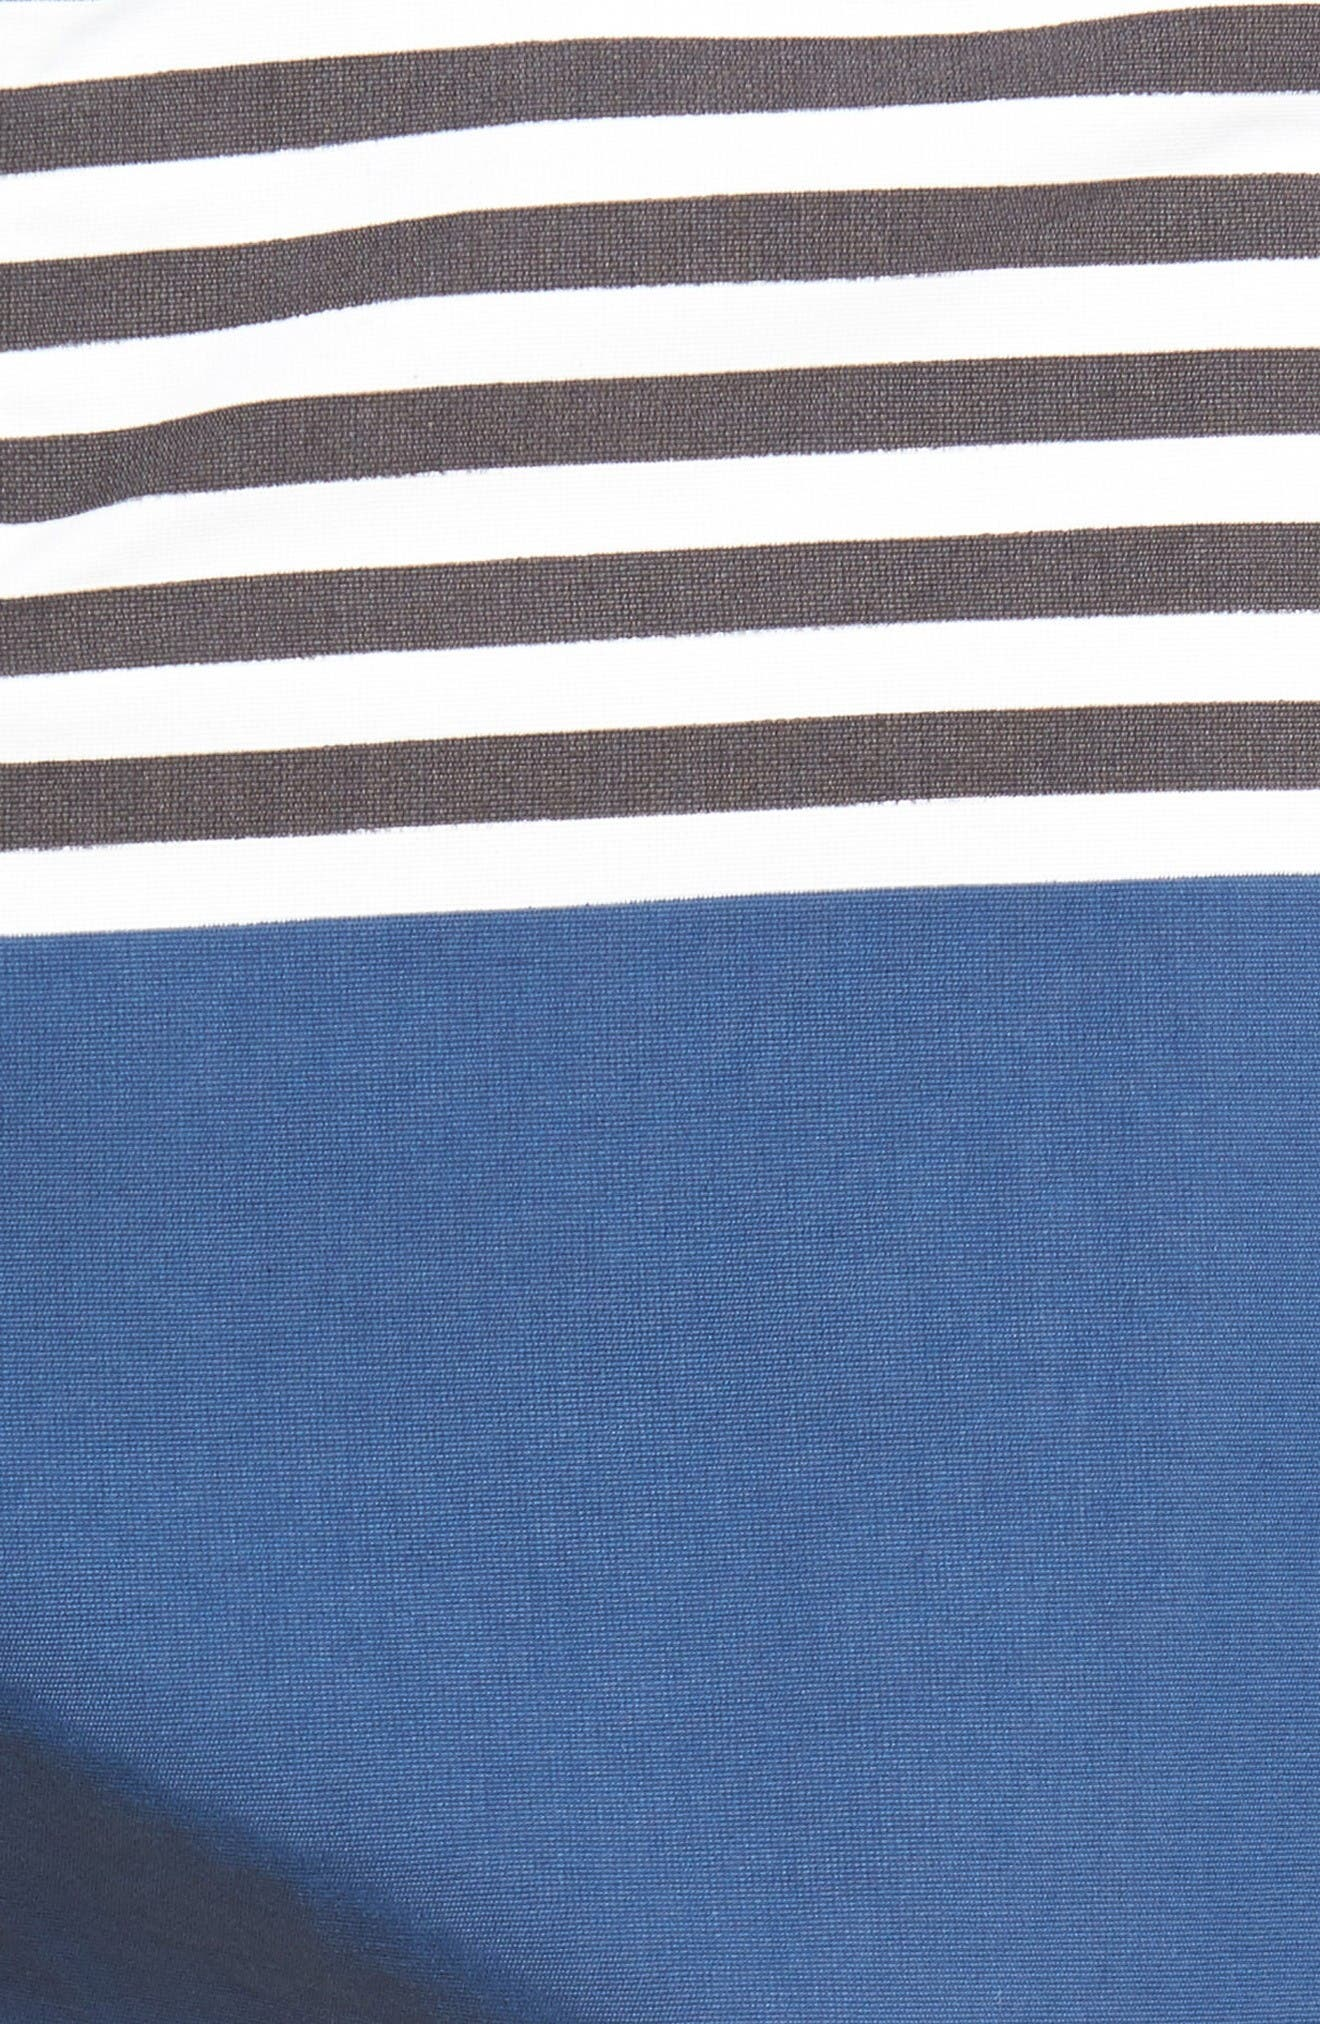 Wavefarer Board Shorts,                             Alternate thumbnail 5, color,                             Yurt Yellow